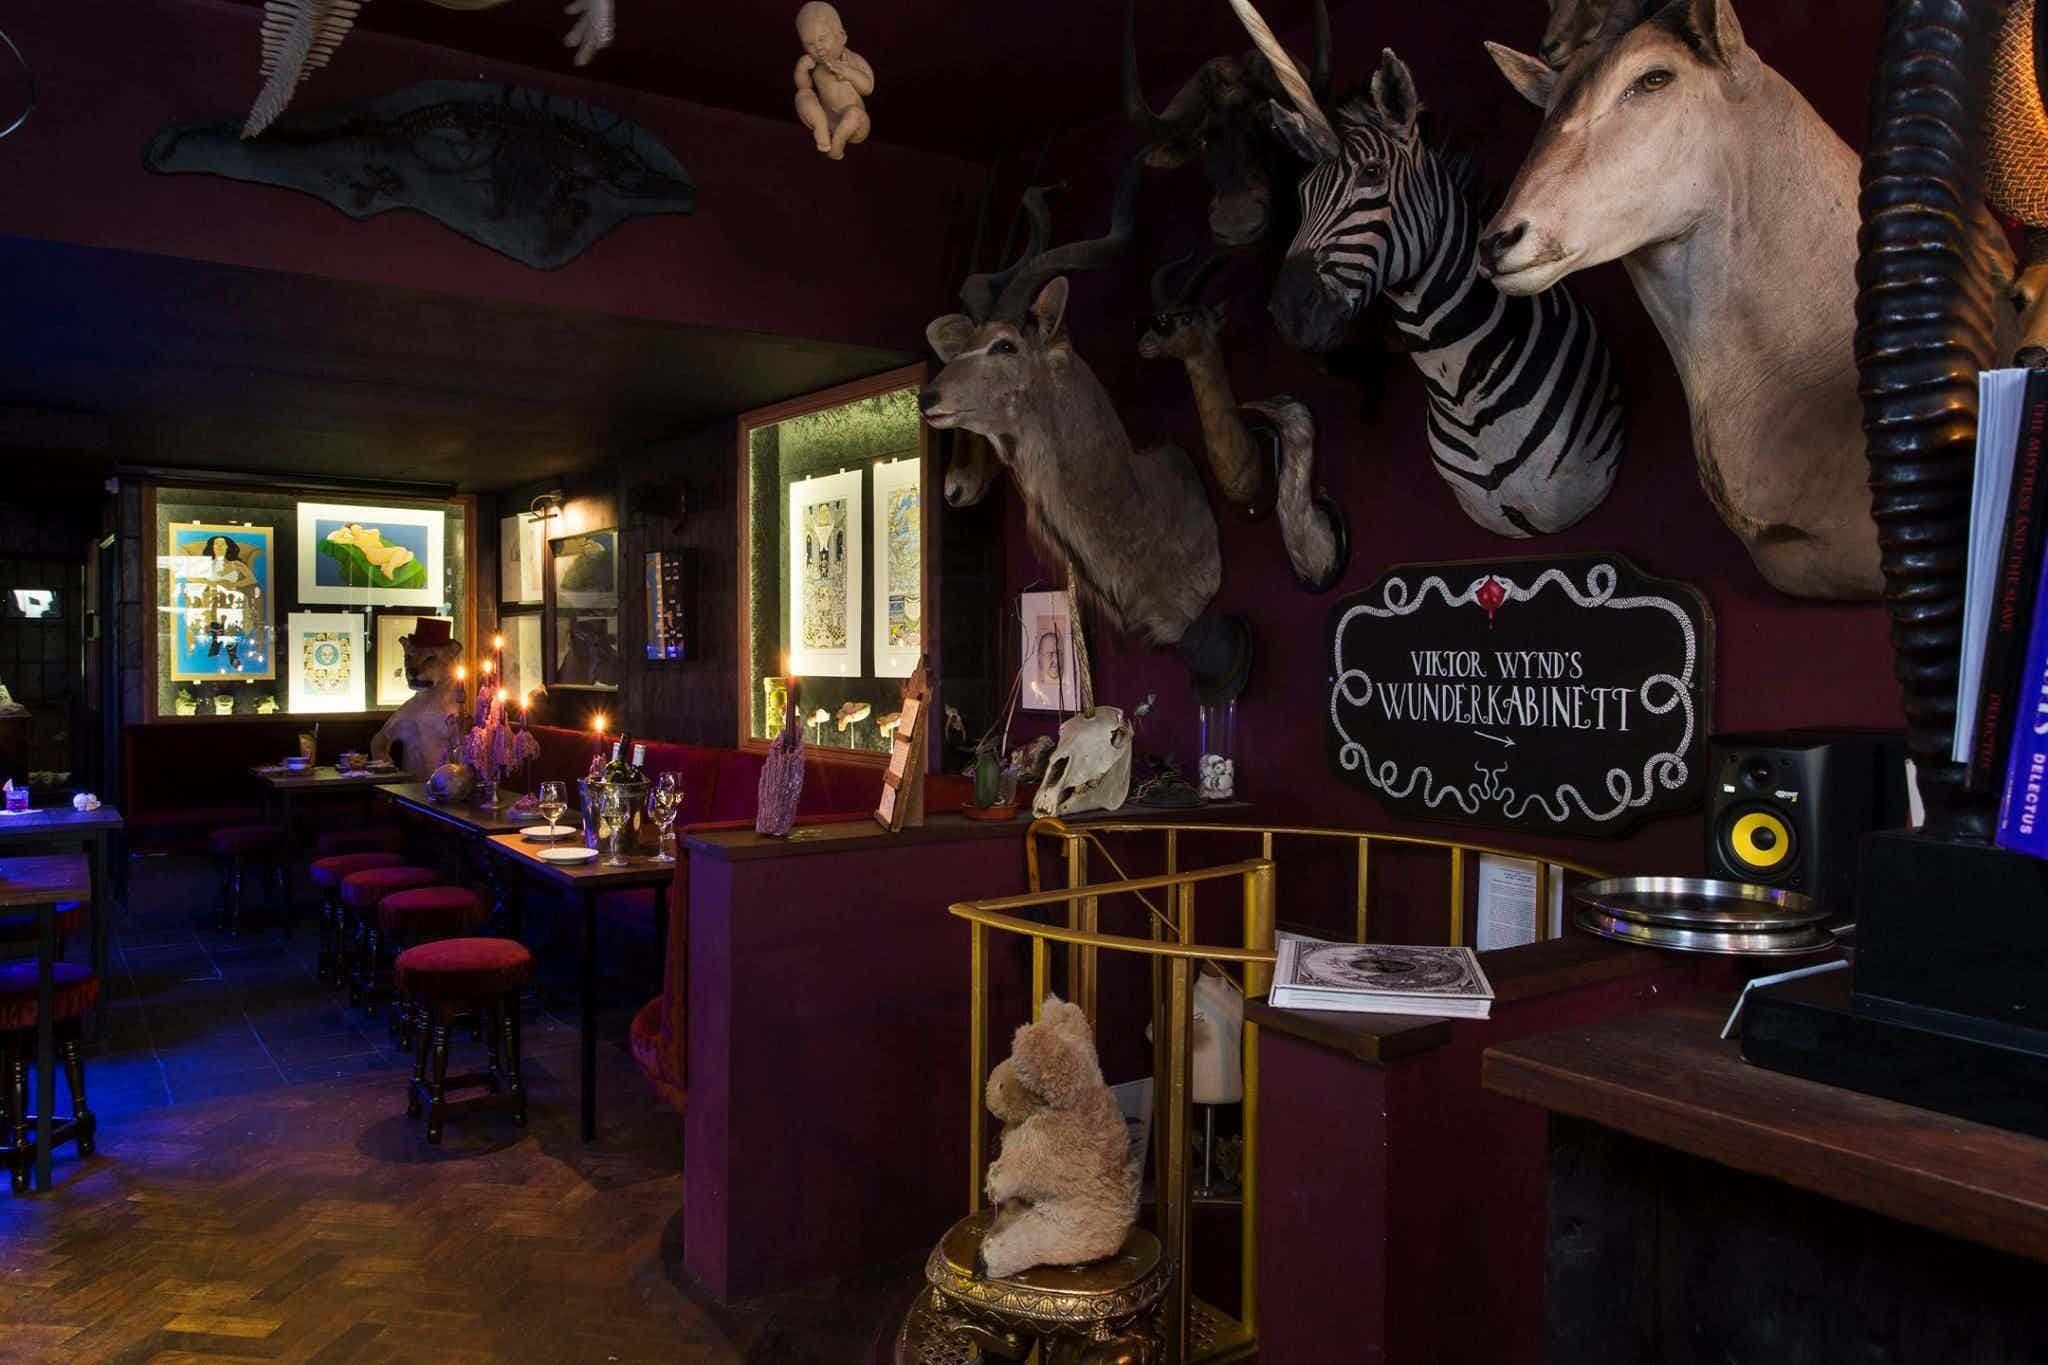 East London's Most Curious Cocktail Bar, The Last Tuesday Society & Viktor Wynd Museum of Curiosities